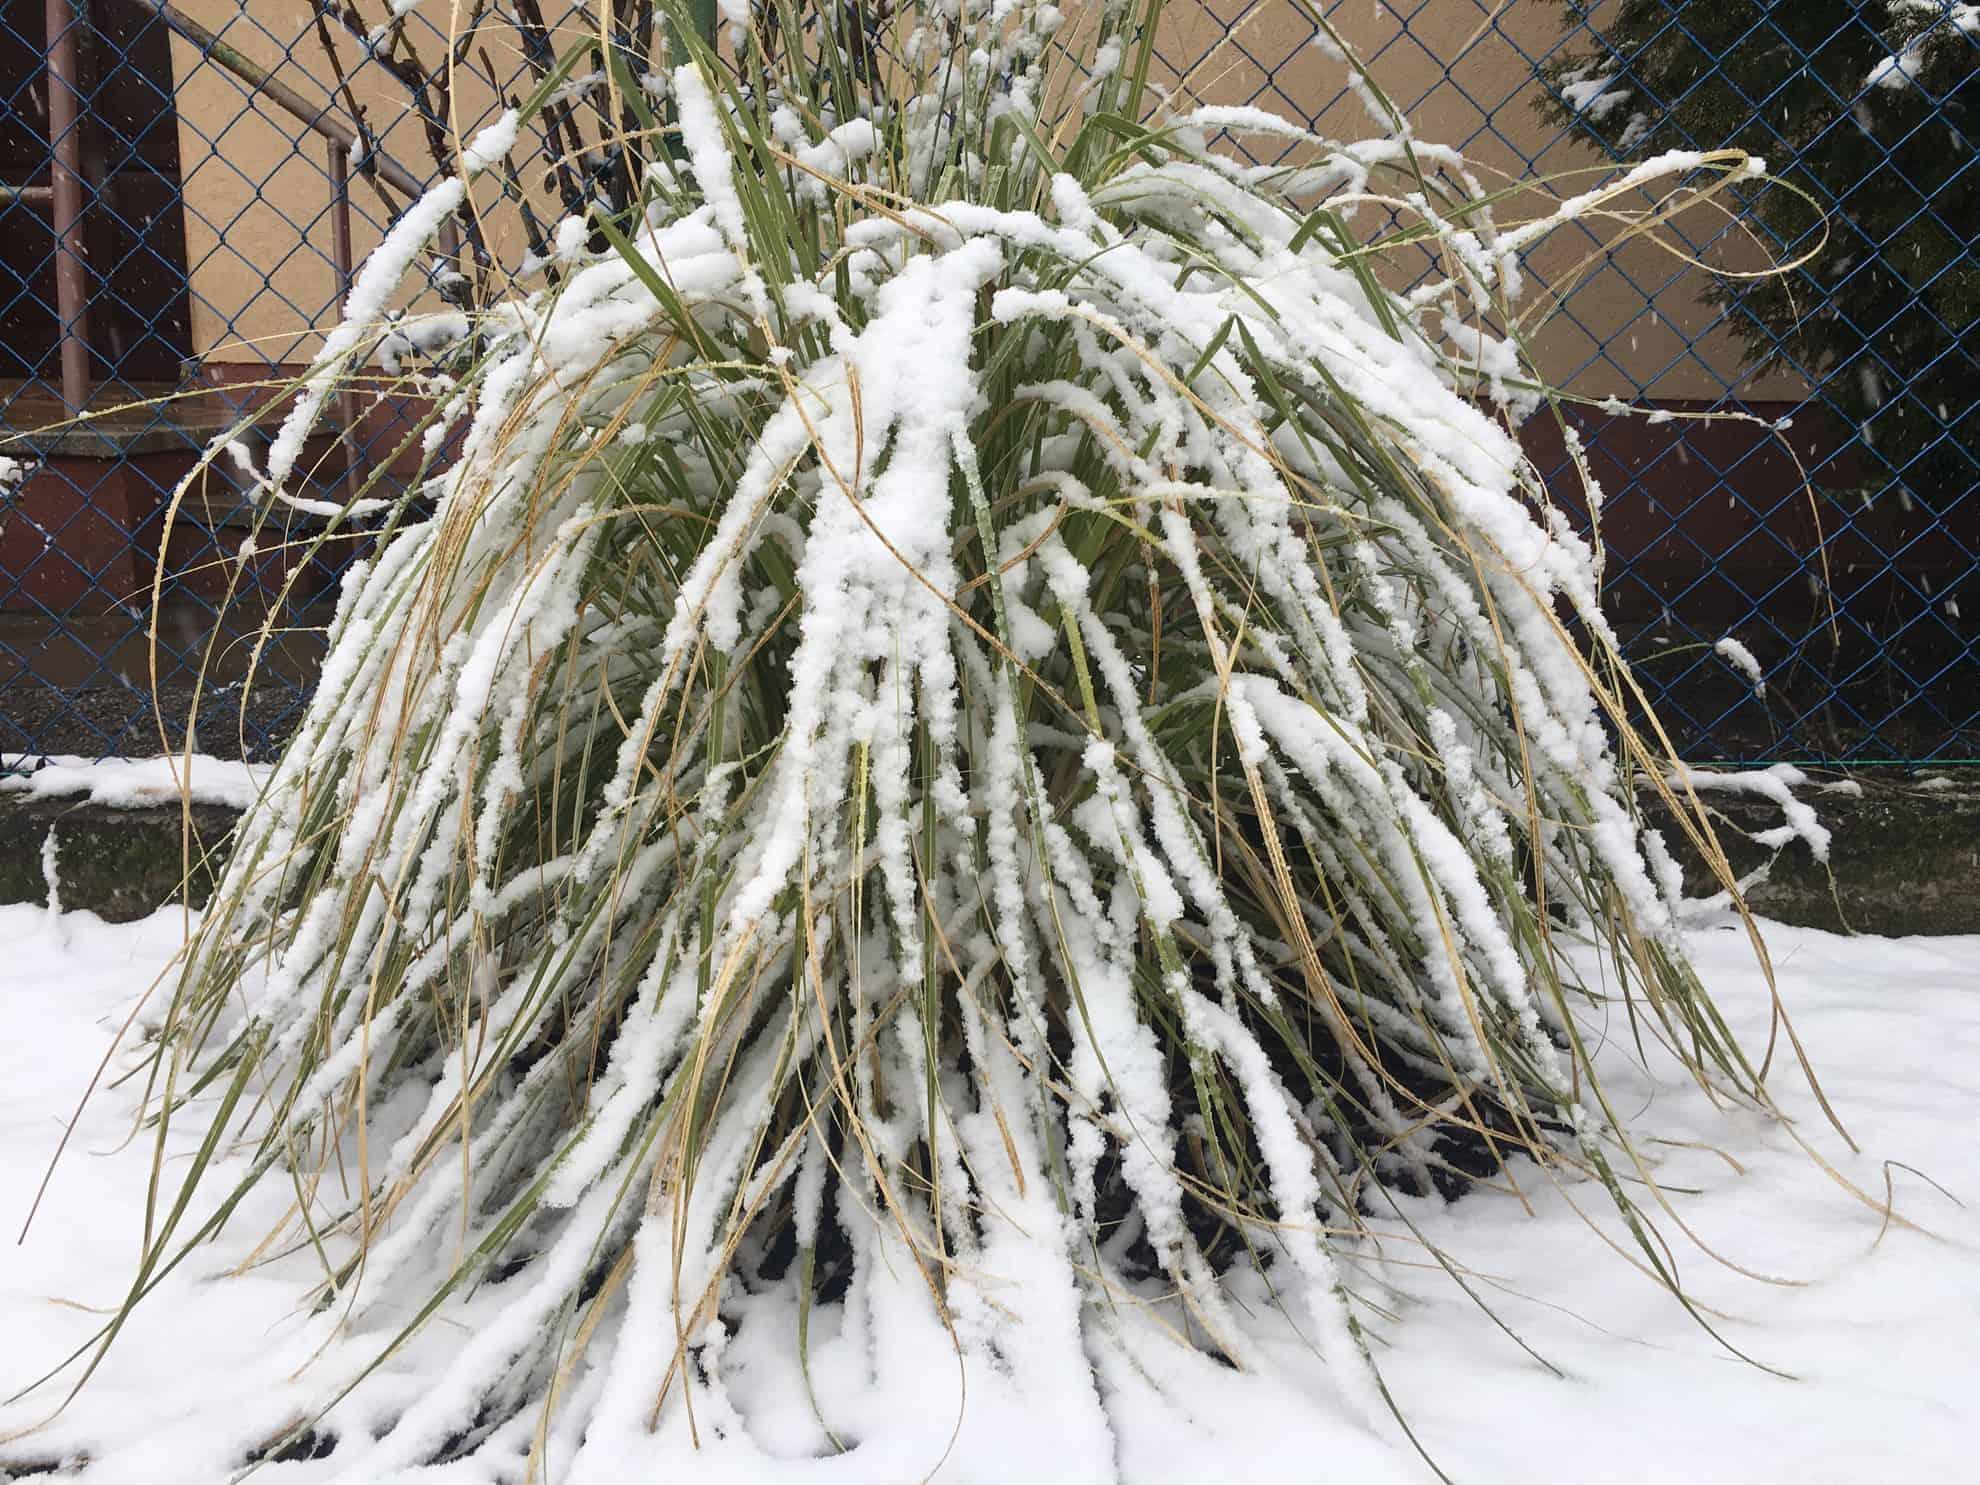 hóval borított pampafű